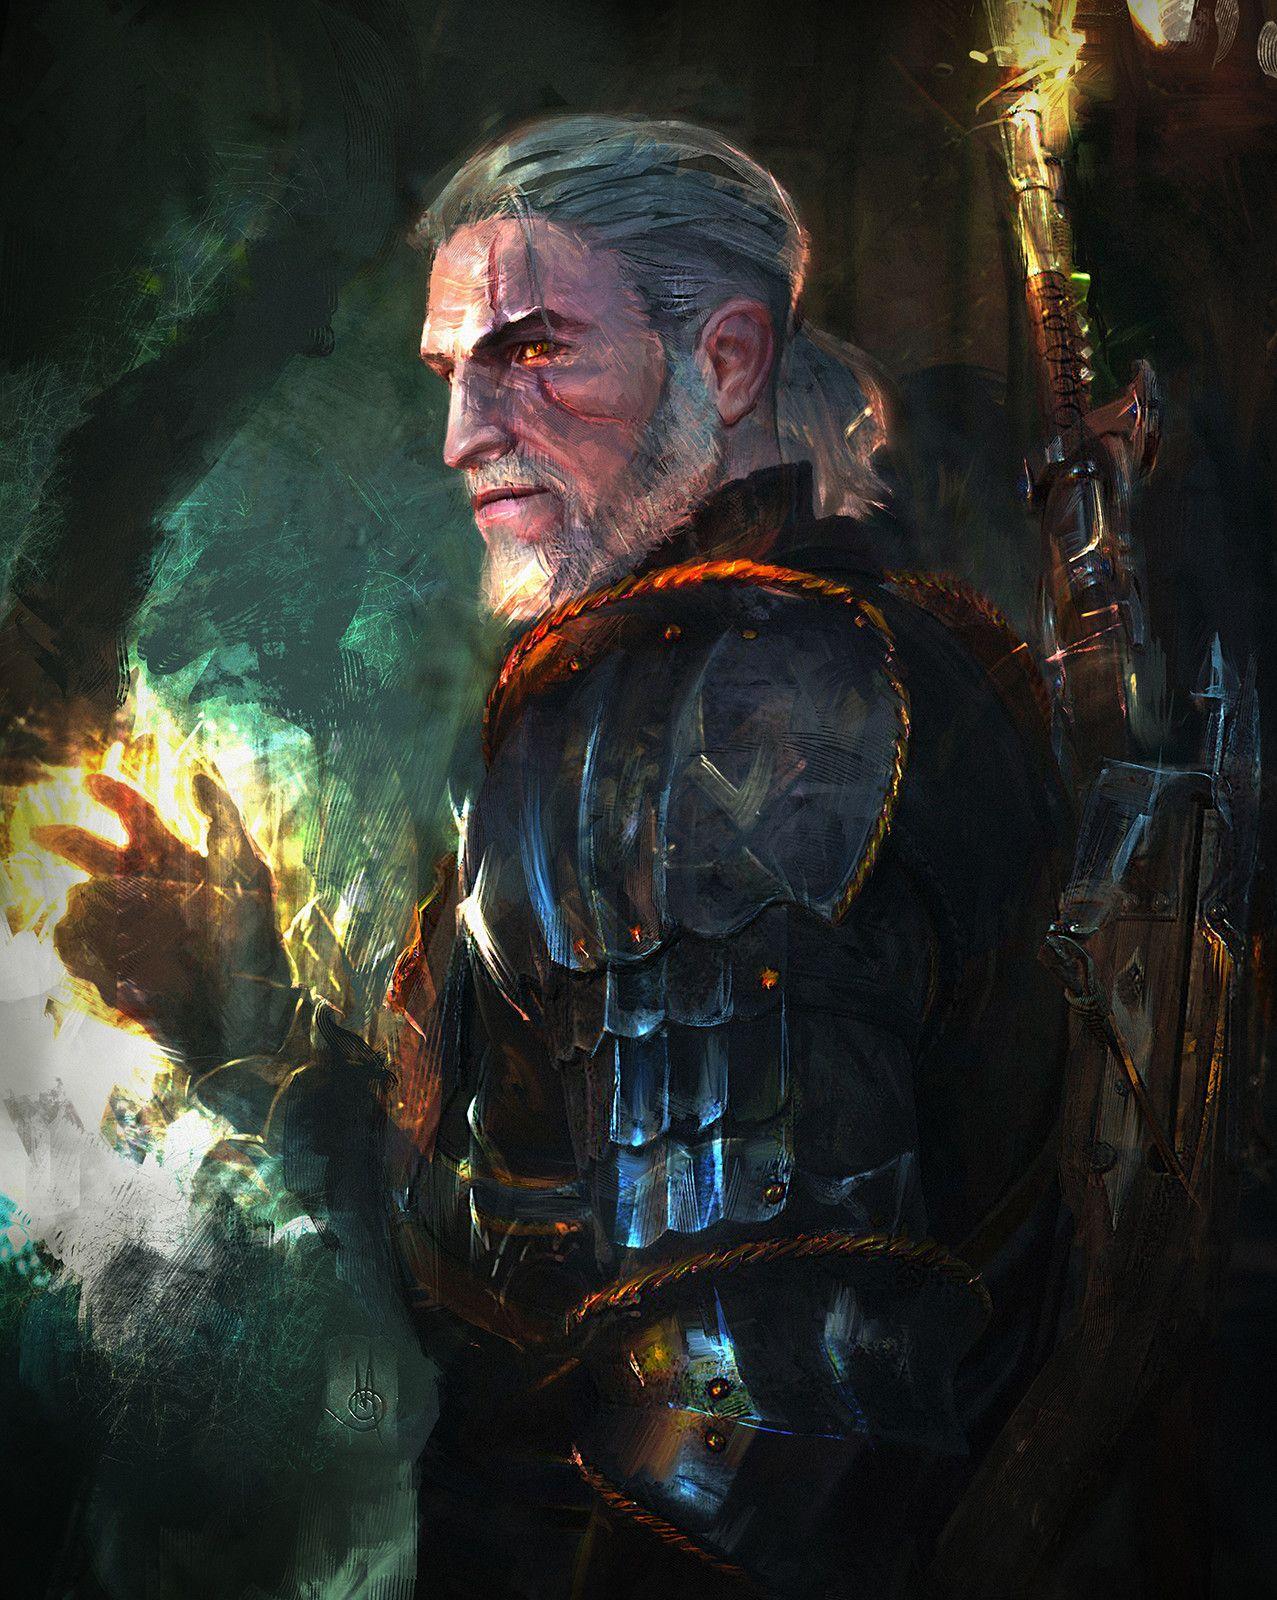 Geralt of Rivia (The Witcher), Murat Gül on ArtStation at https://www.artstation.com/artwork/l6Xze